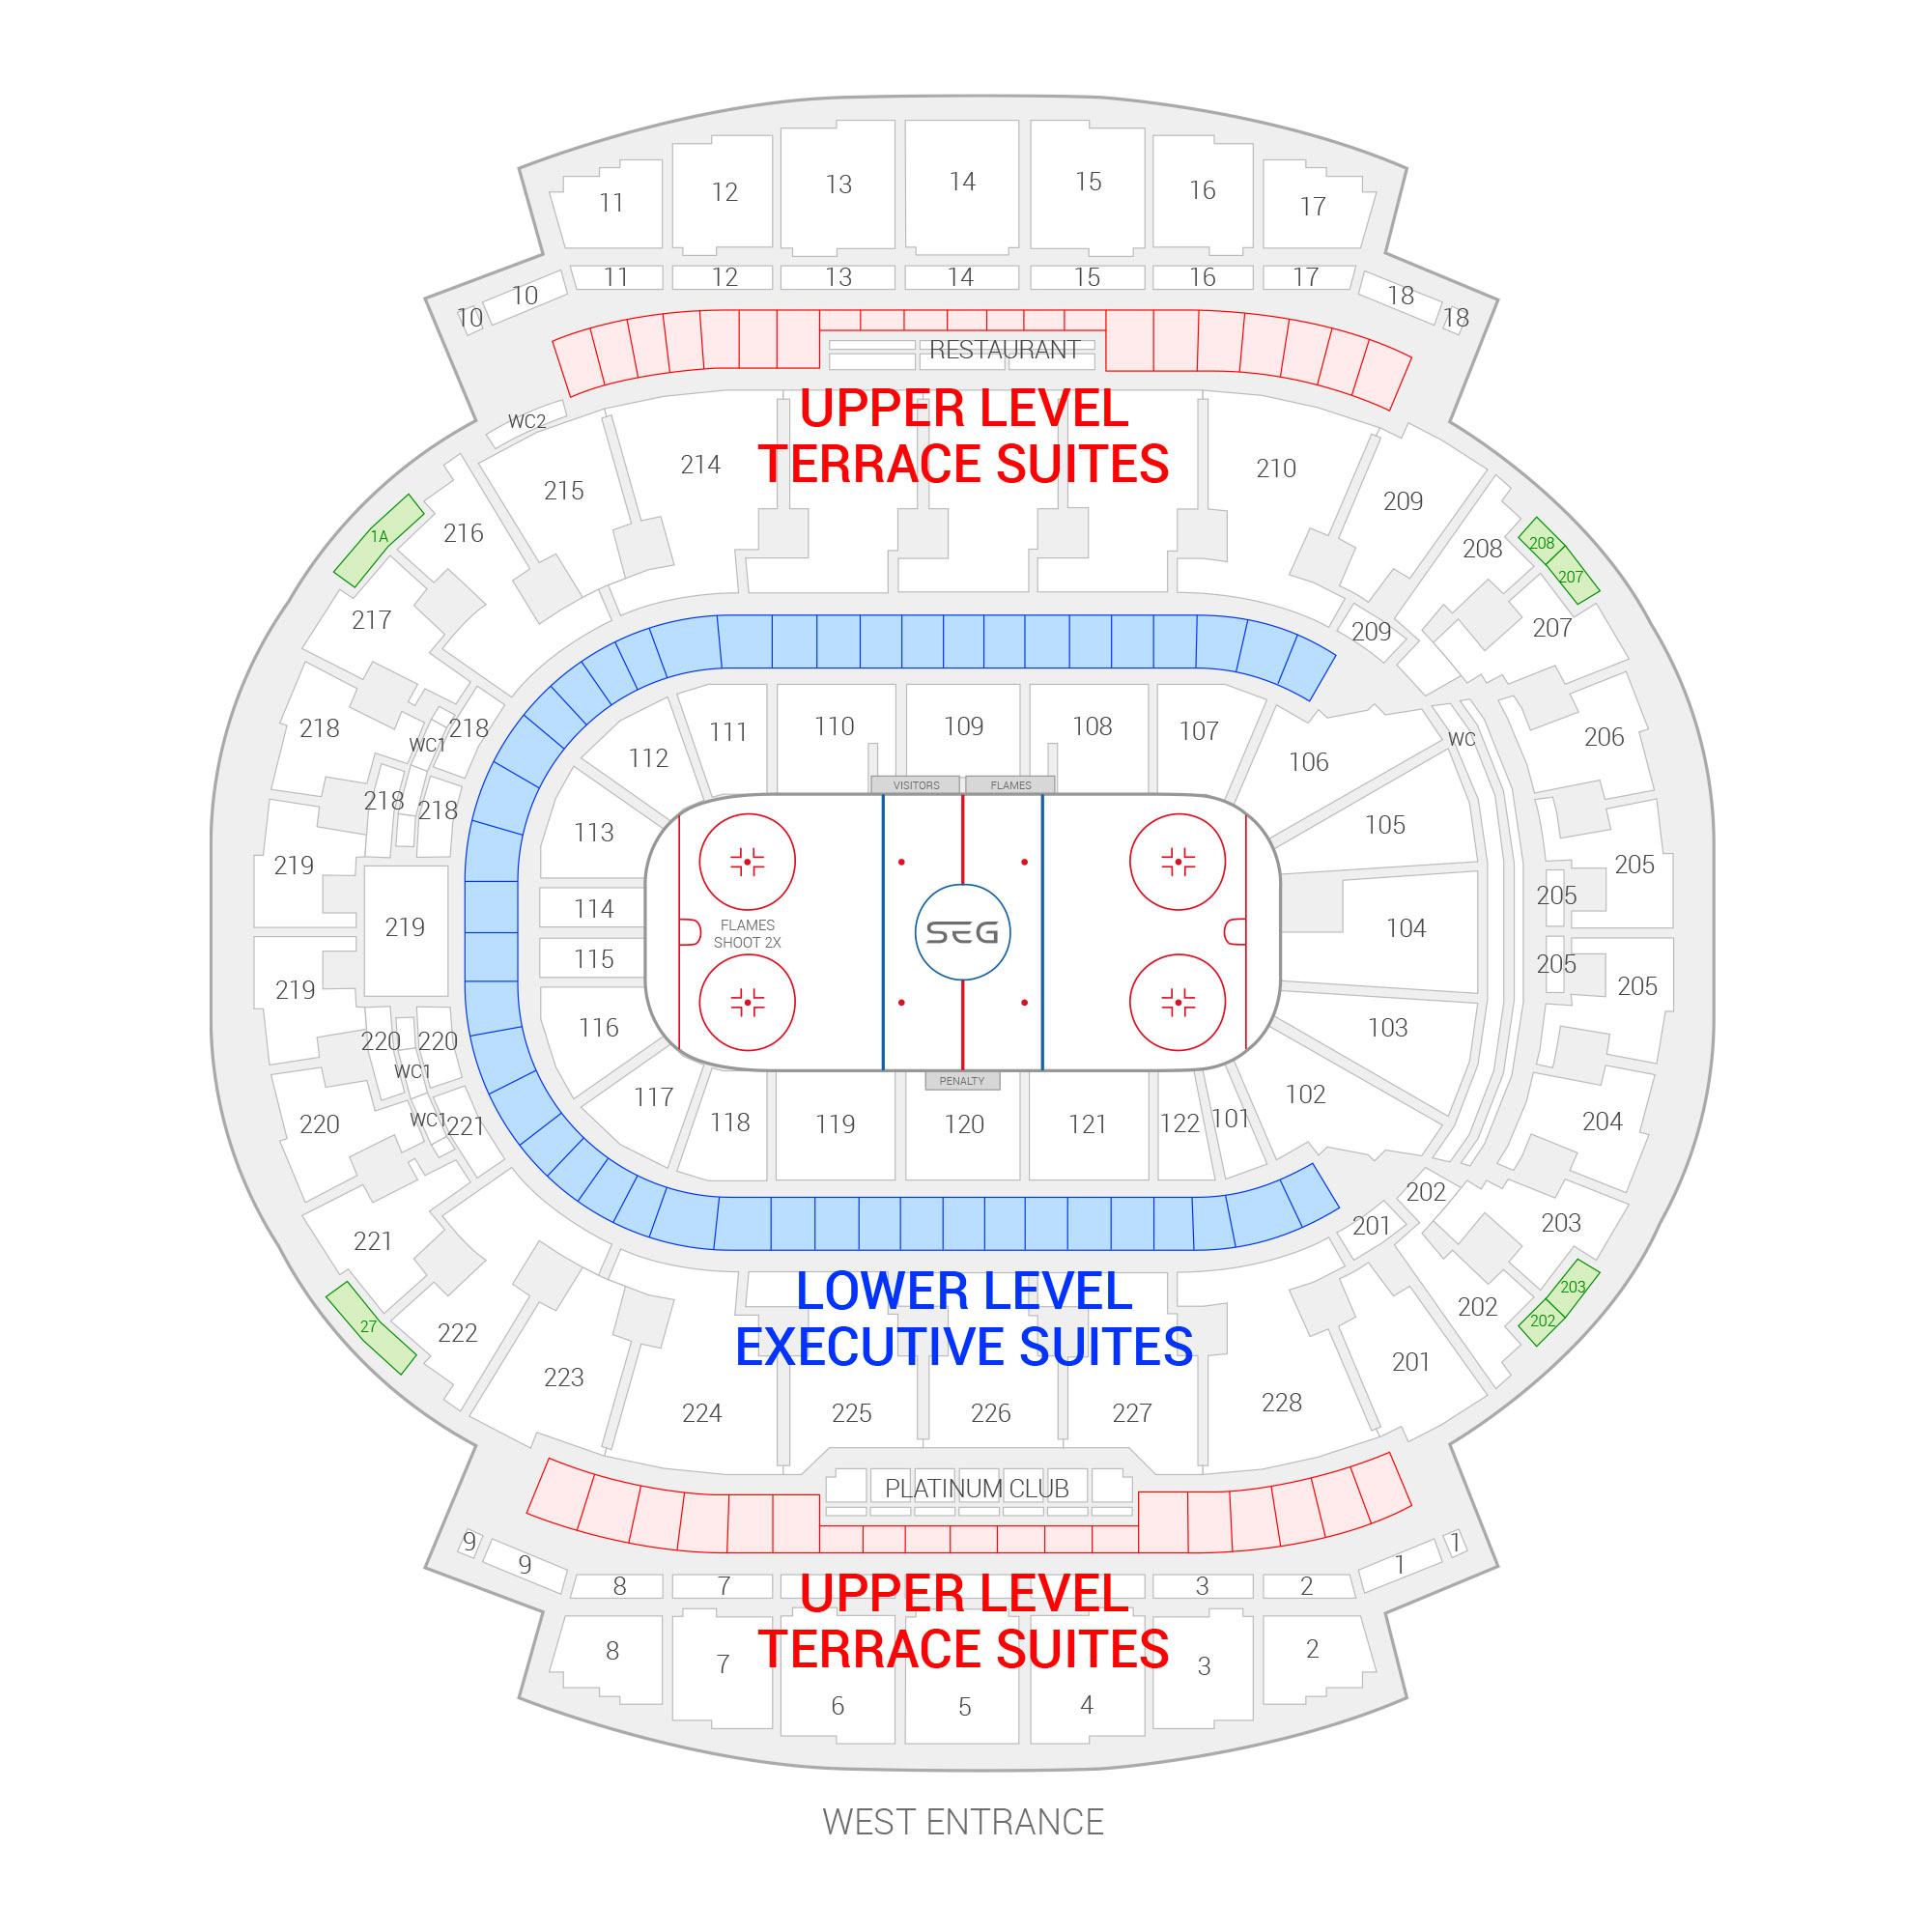 Scotiabank Saddledome / Calgary Flames Suite Map and Seating Chart